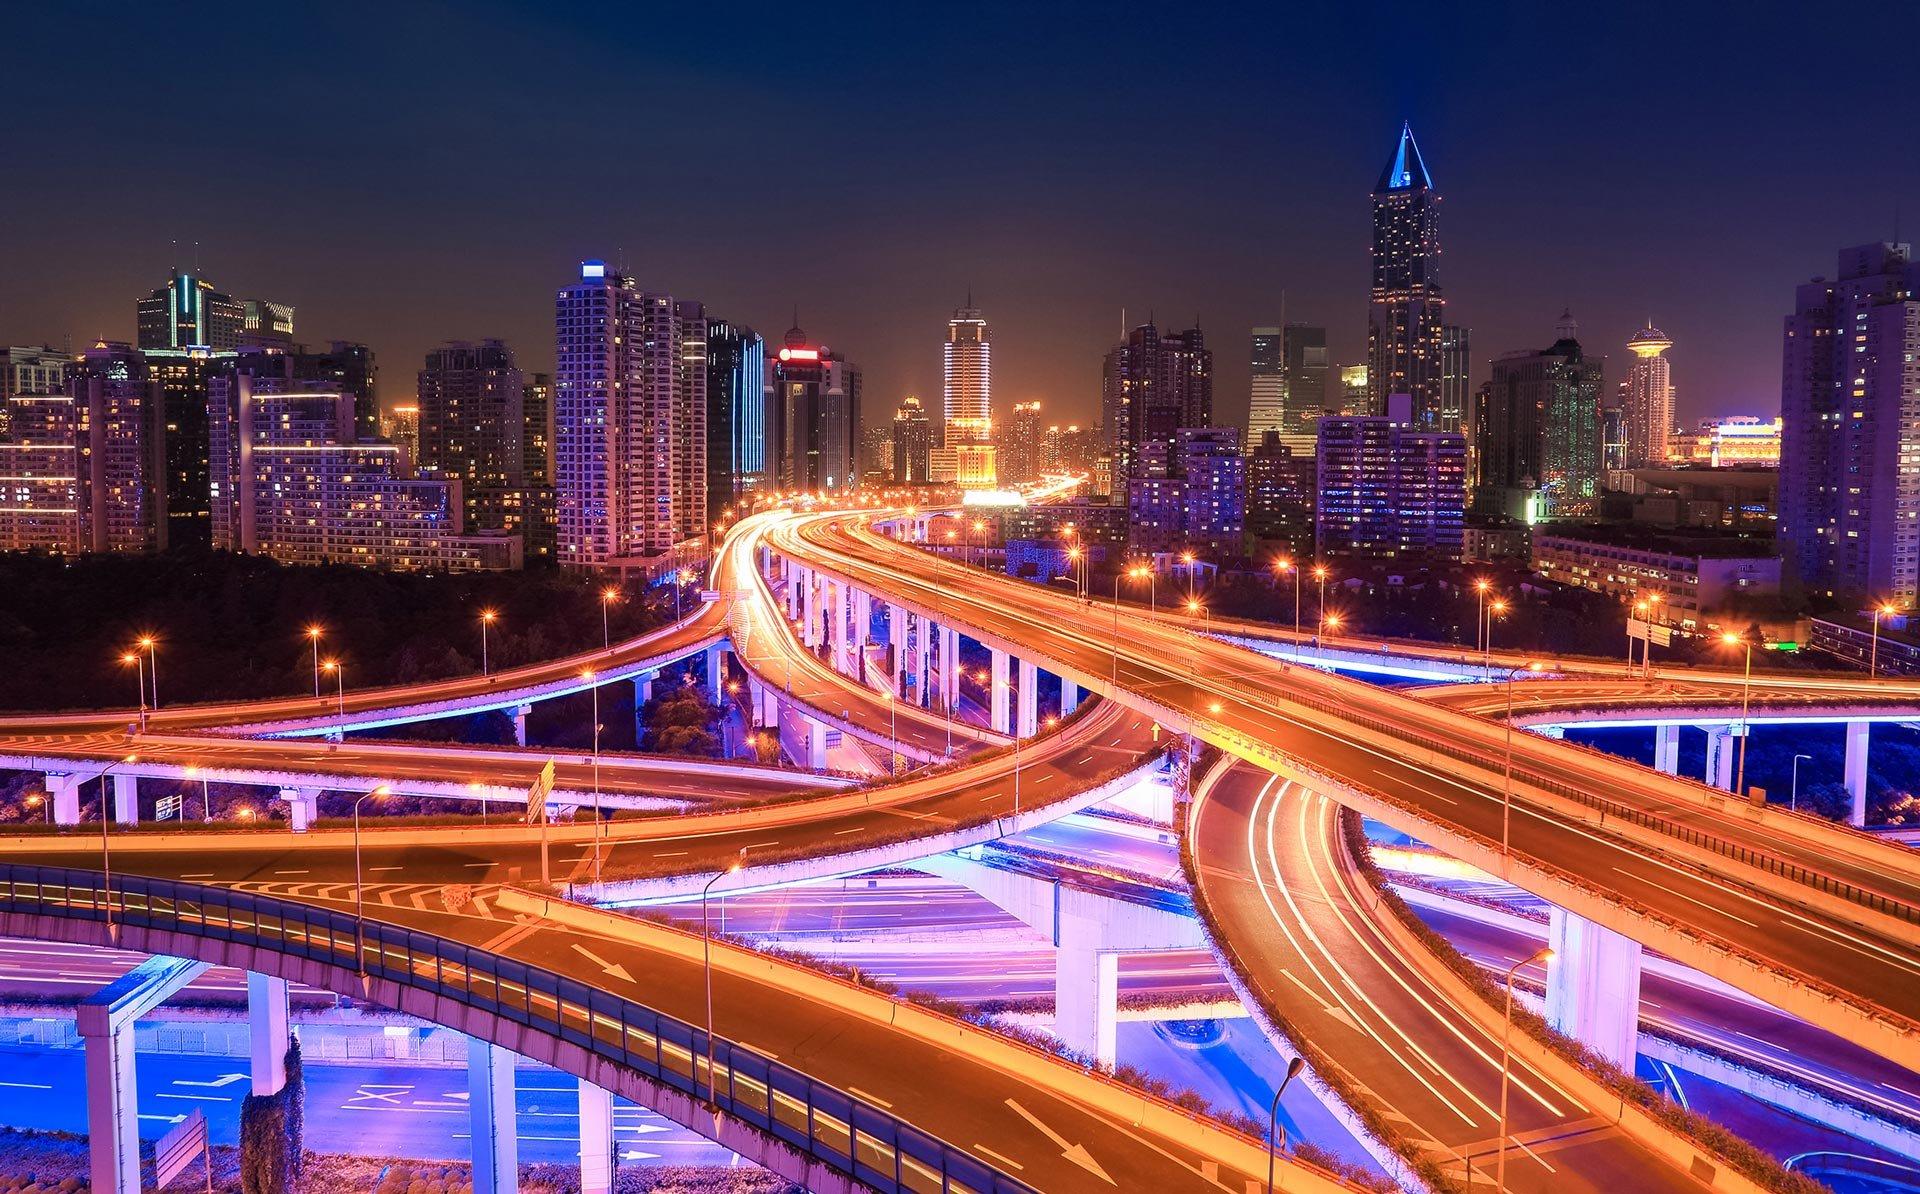 Telna - City Traffic Backgroung - Videos Header